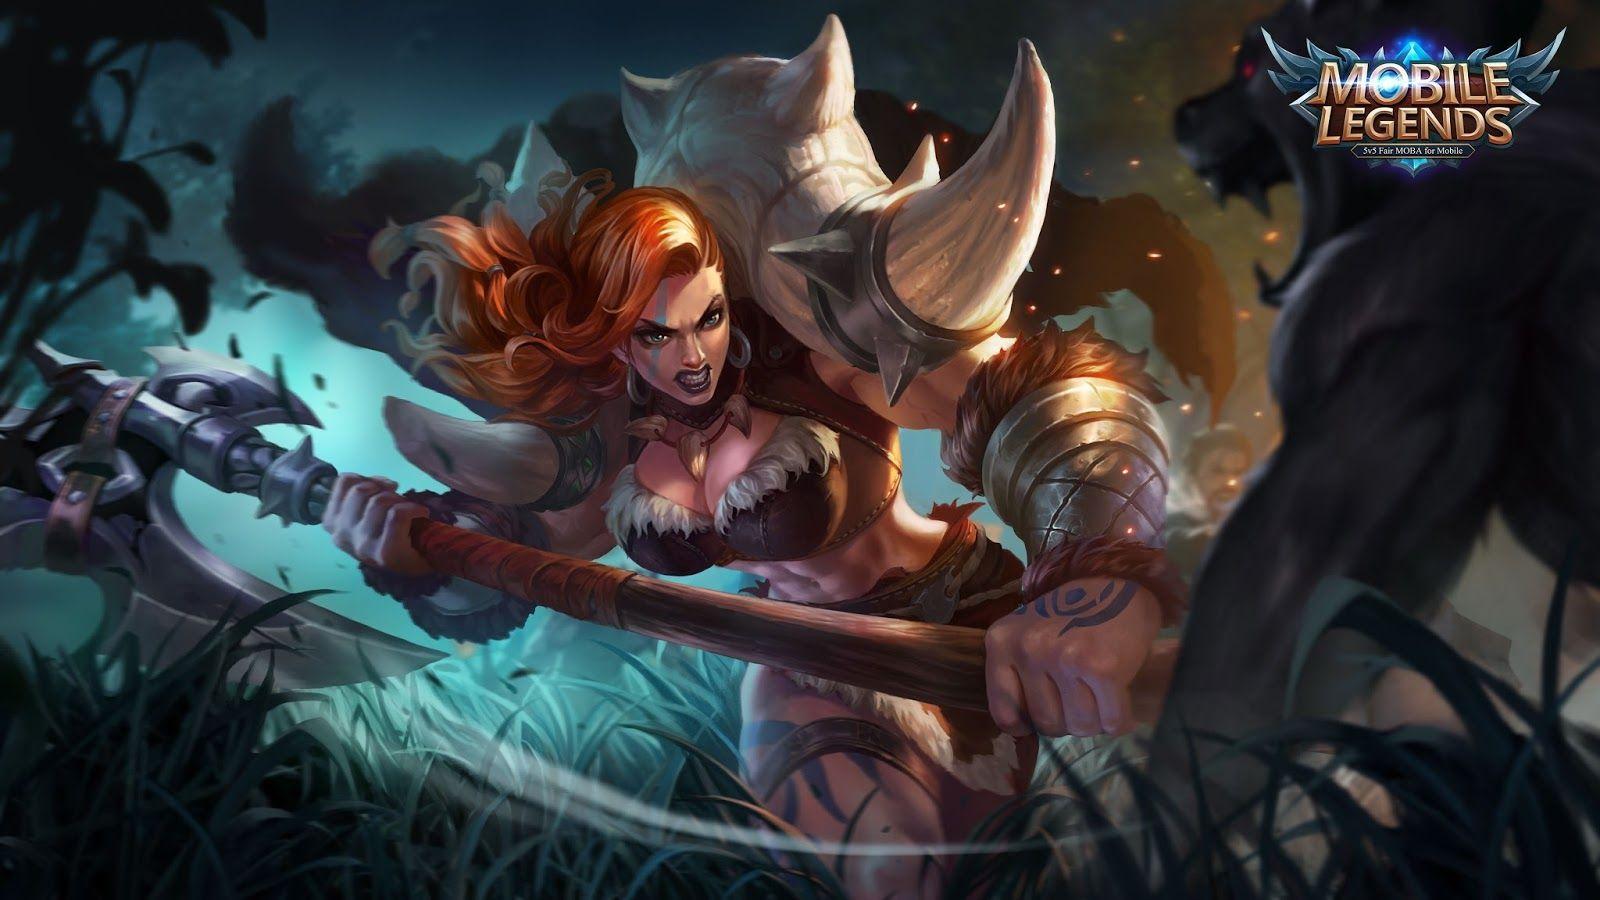 Elegant Mobile Legends New Hero Hilda U2013 Power Of Megalith | Web Junkies